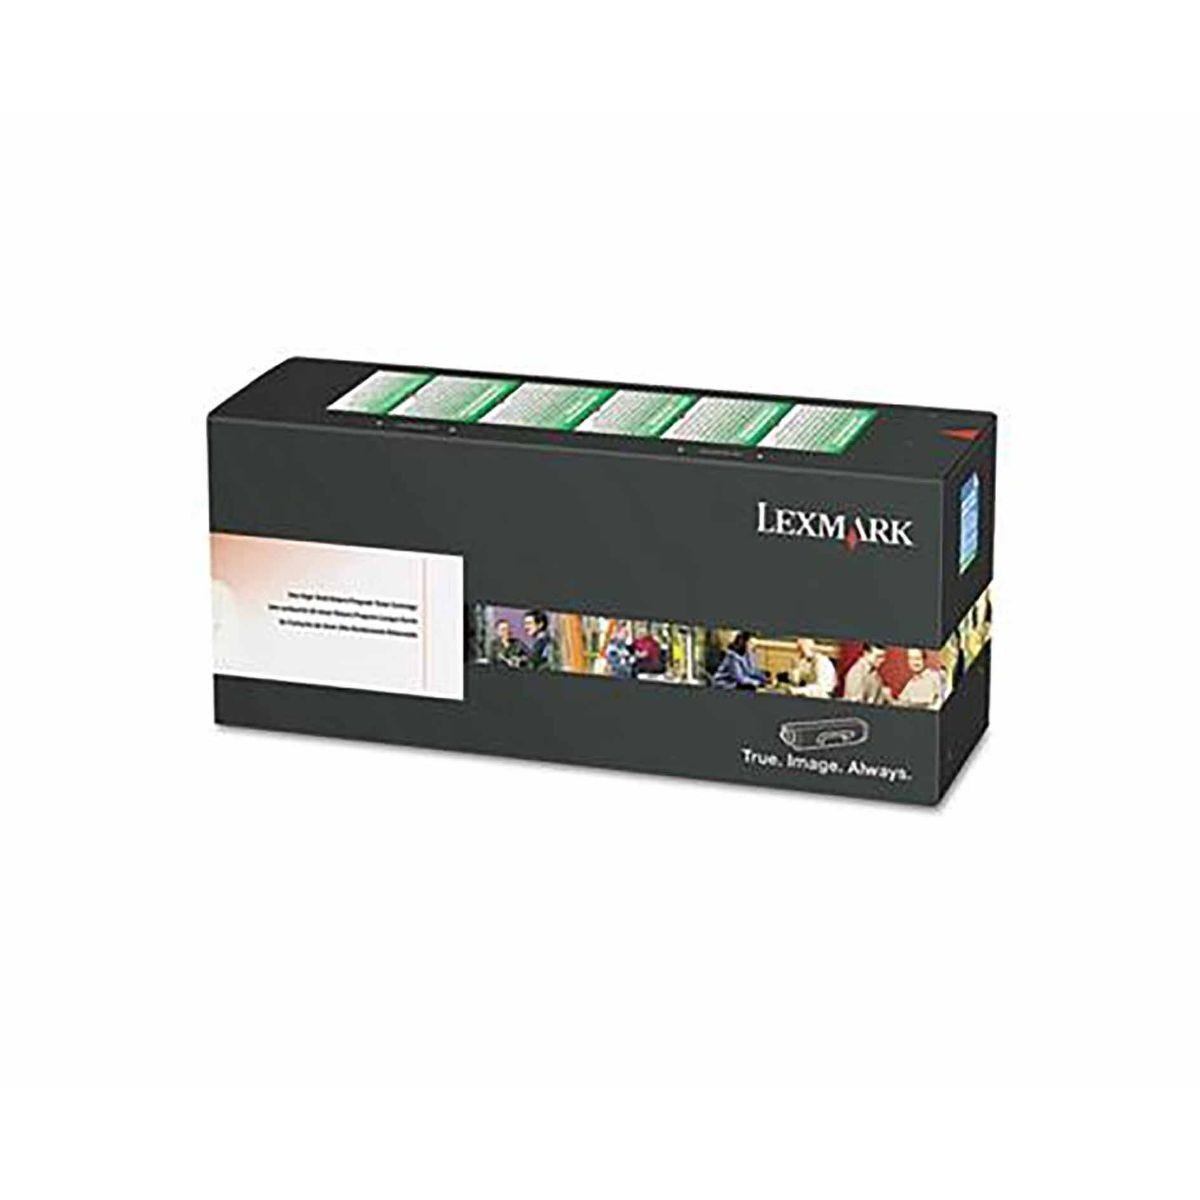 Lexmark 702XK Extra High Yield Black Original Toner Cartridge